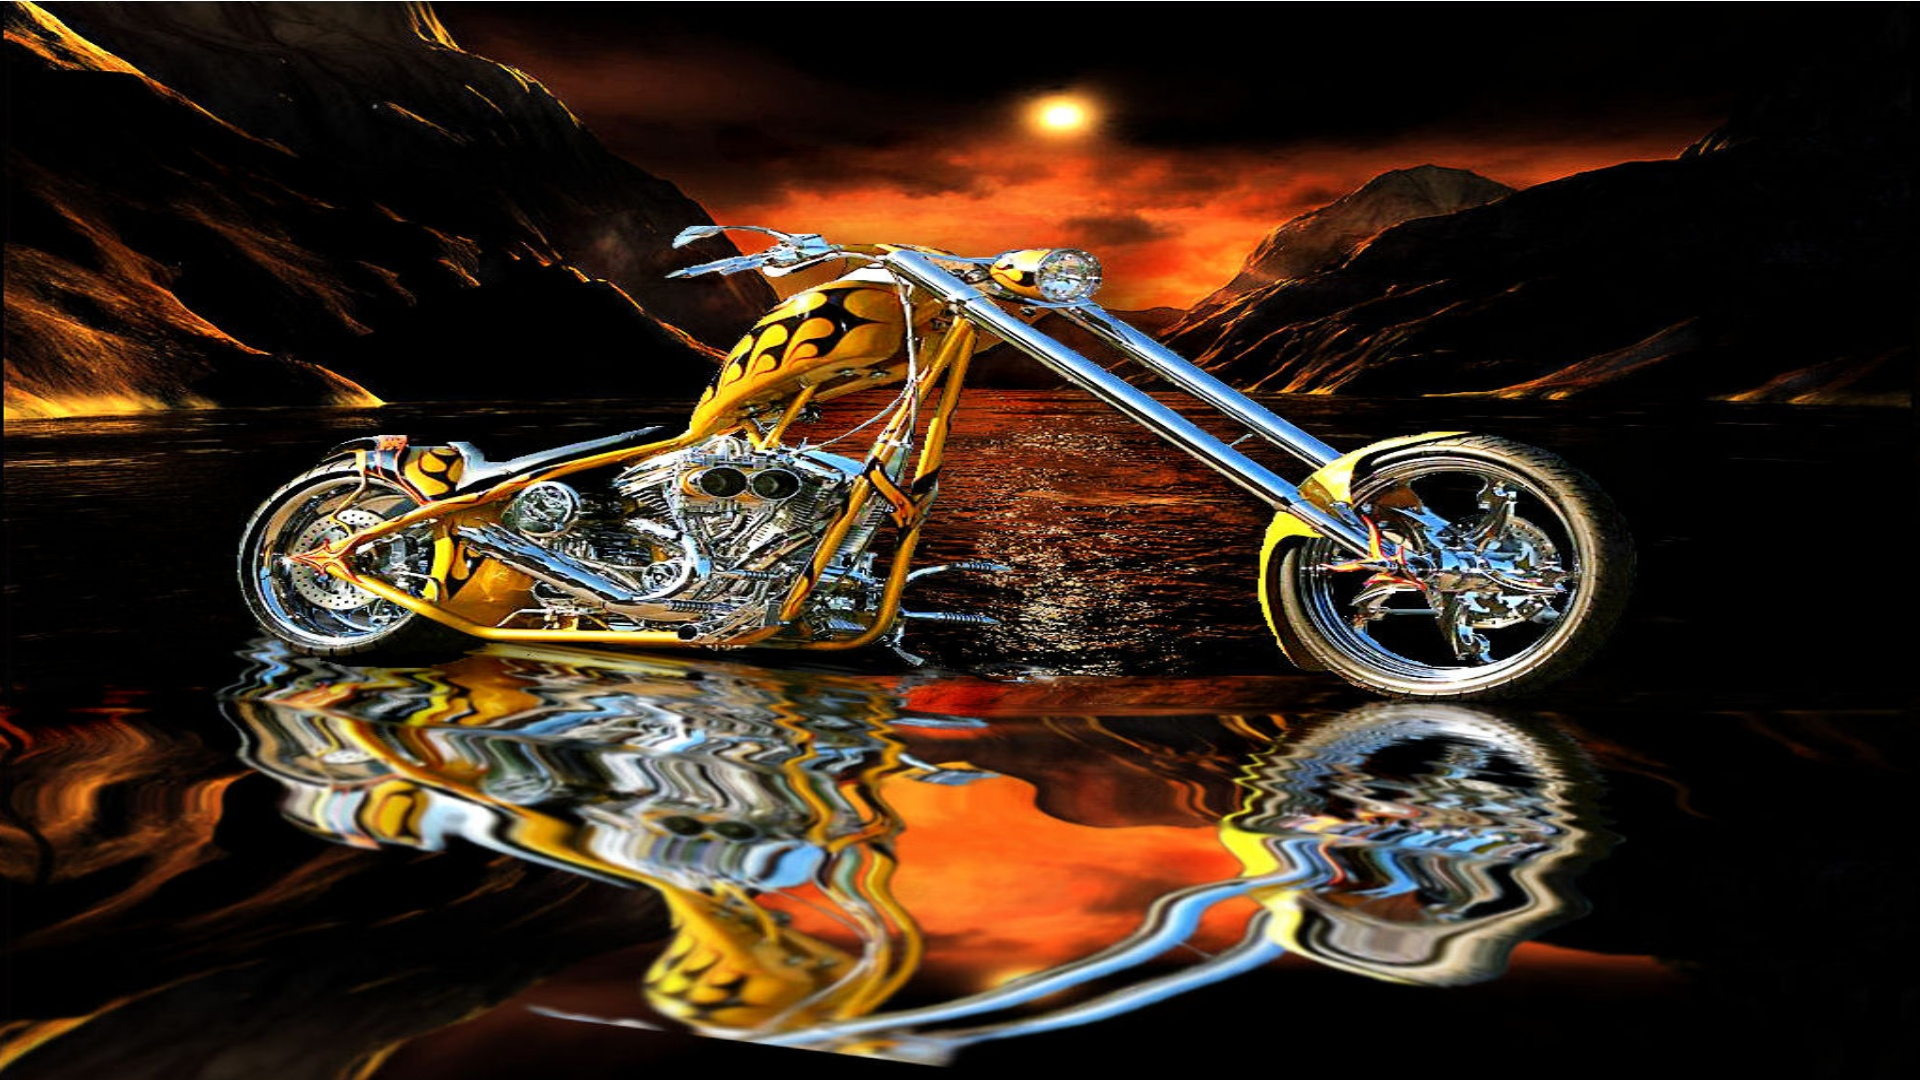 orange county choppers occ custom chopper hot rod rods bike 1920x1080